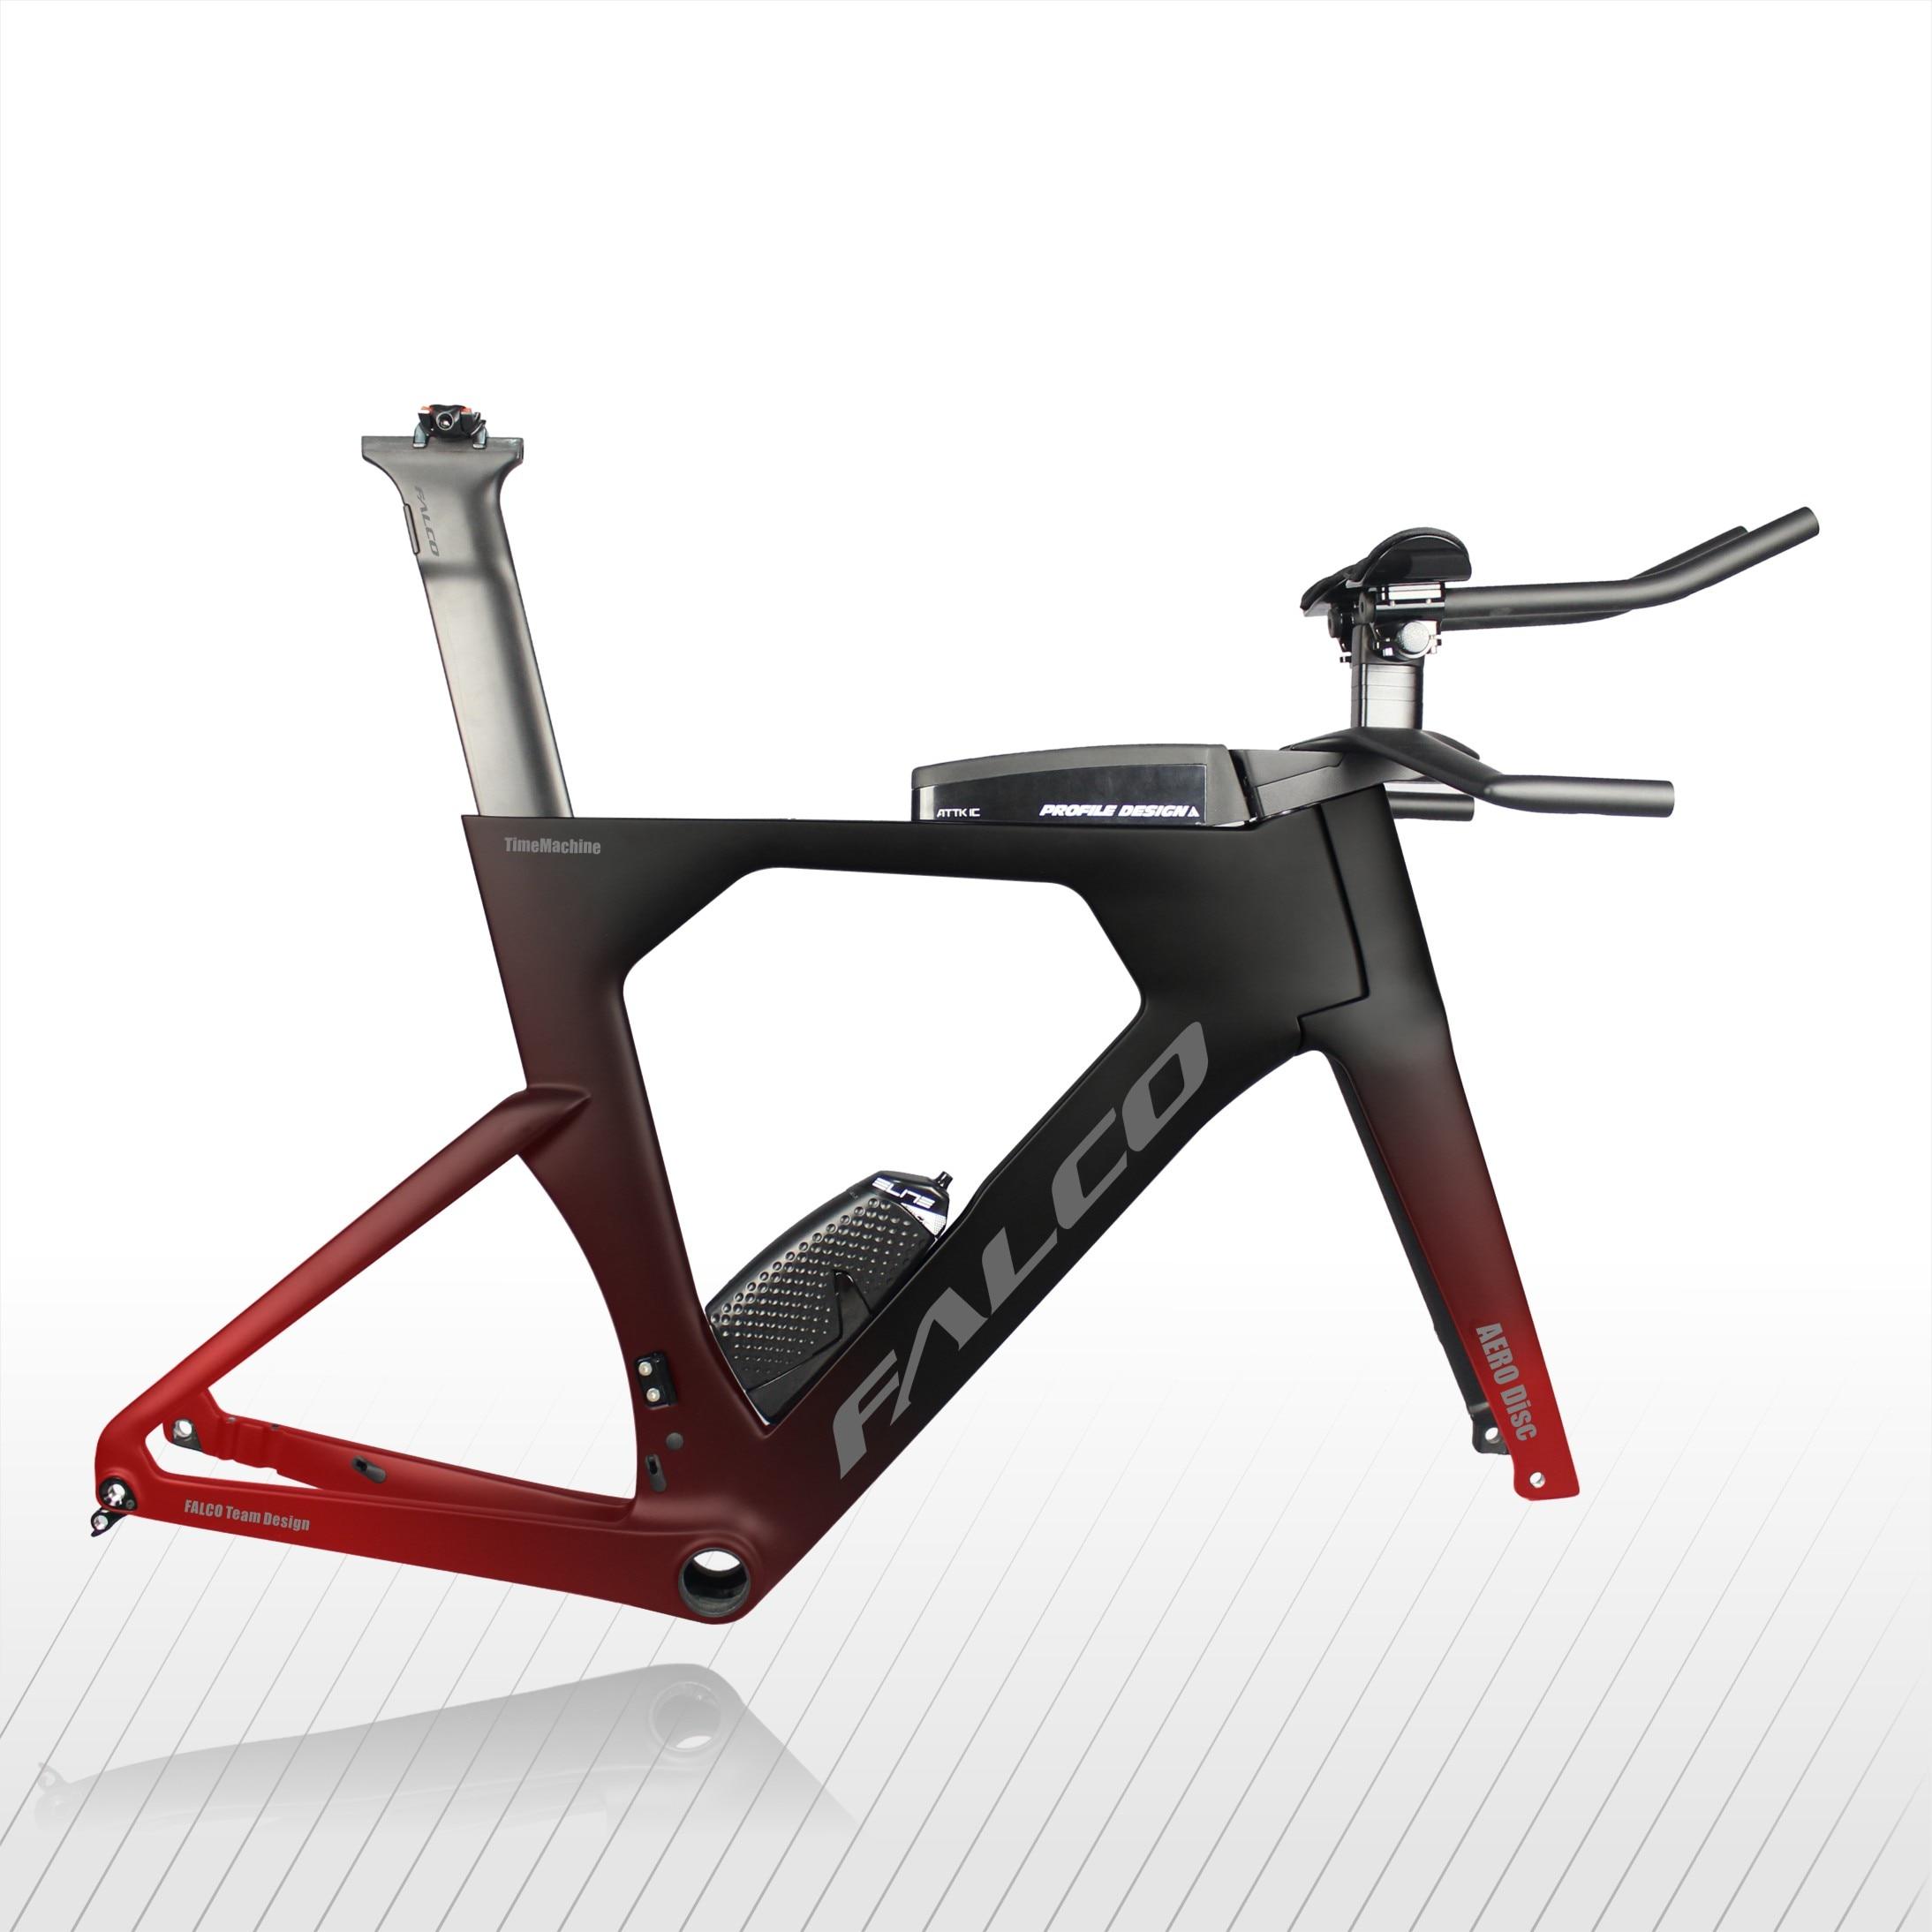 Bicycle-Frame Carbon-Disc Triathlon-Bike Falco Full-Carbon-Fiber-Time New Hot T700